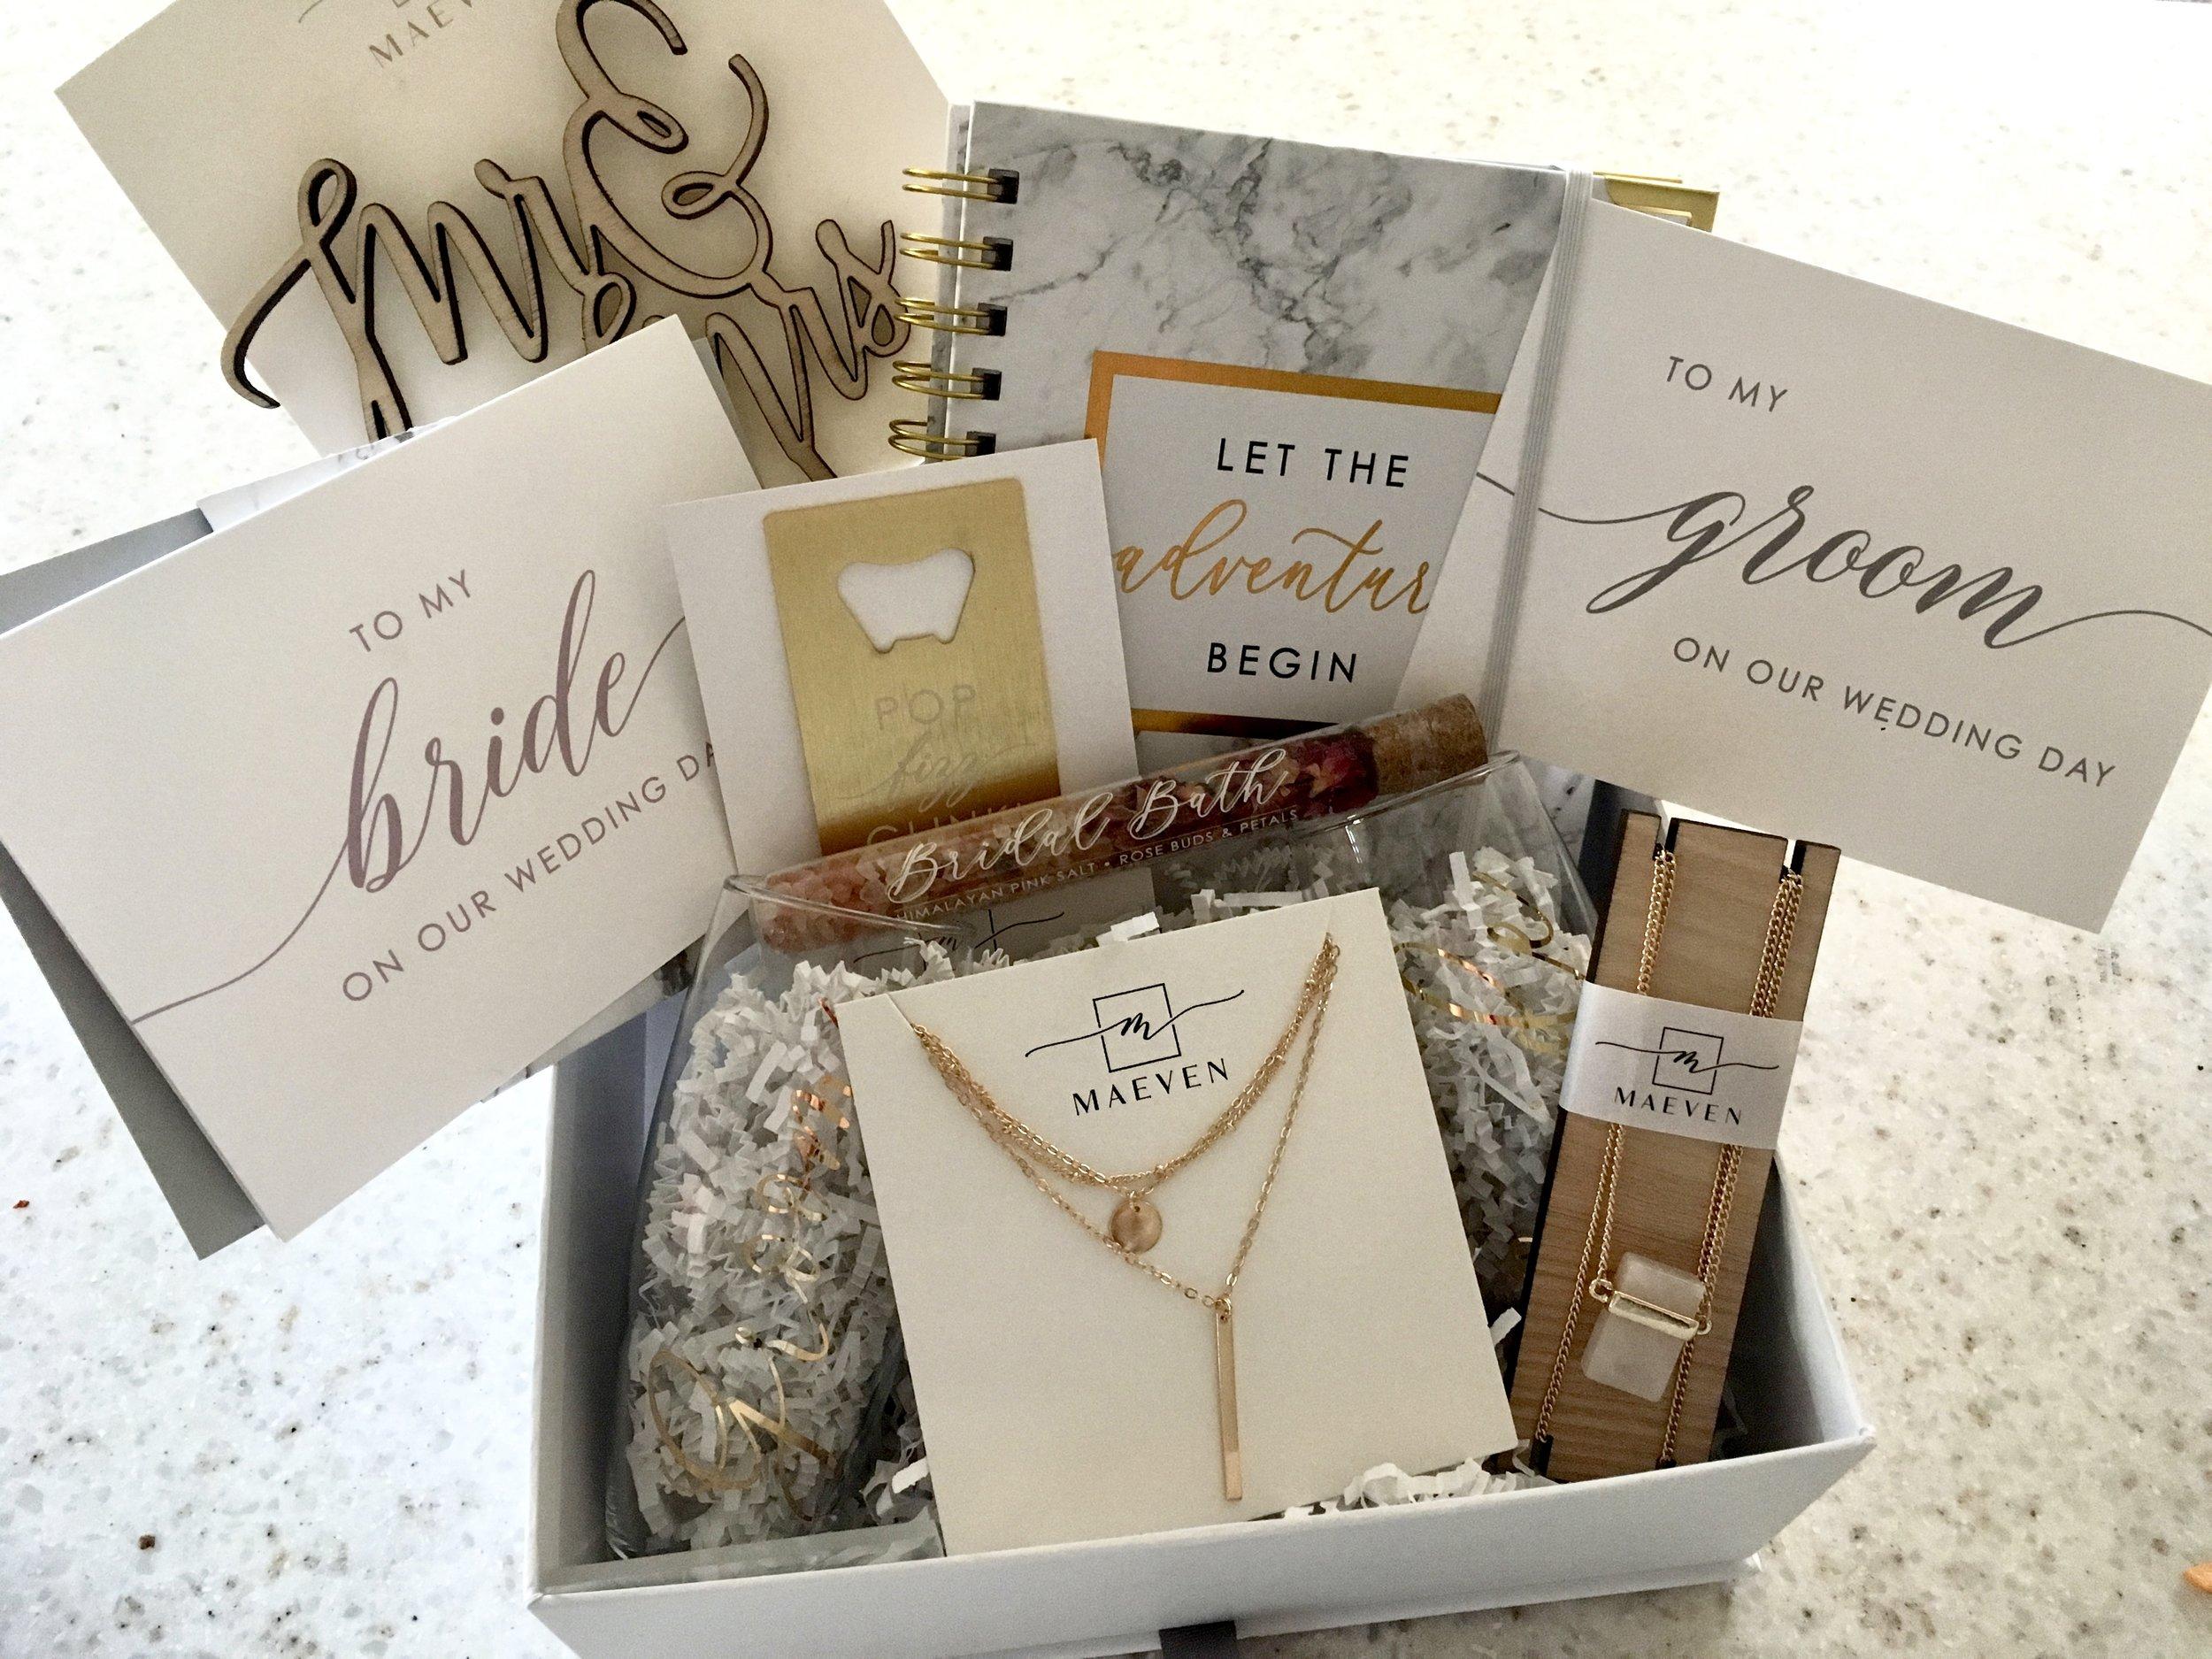 Maeven Wedding Subscription Box